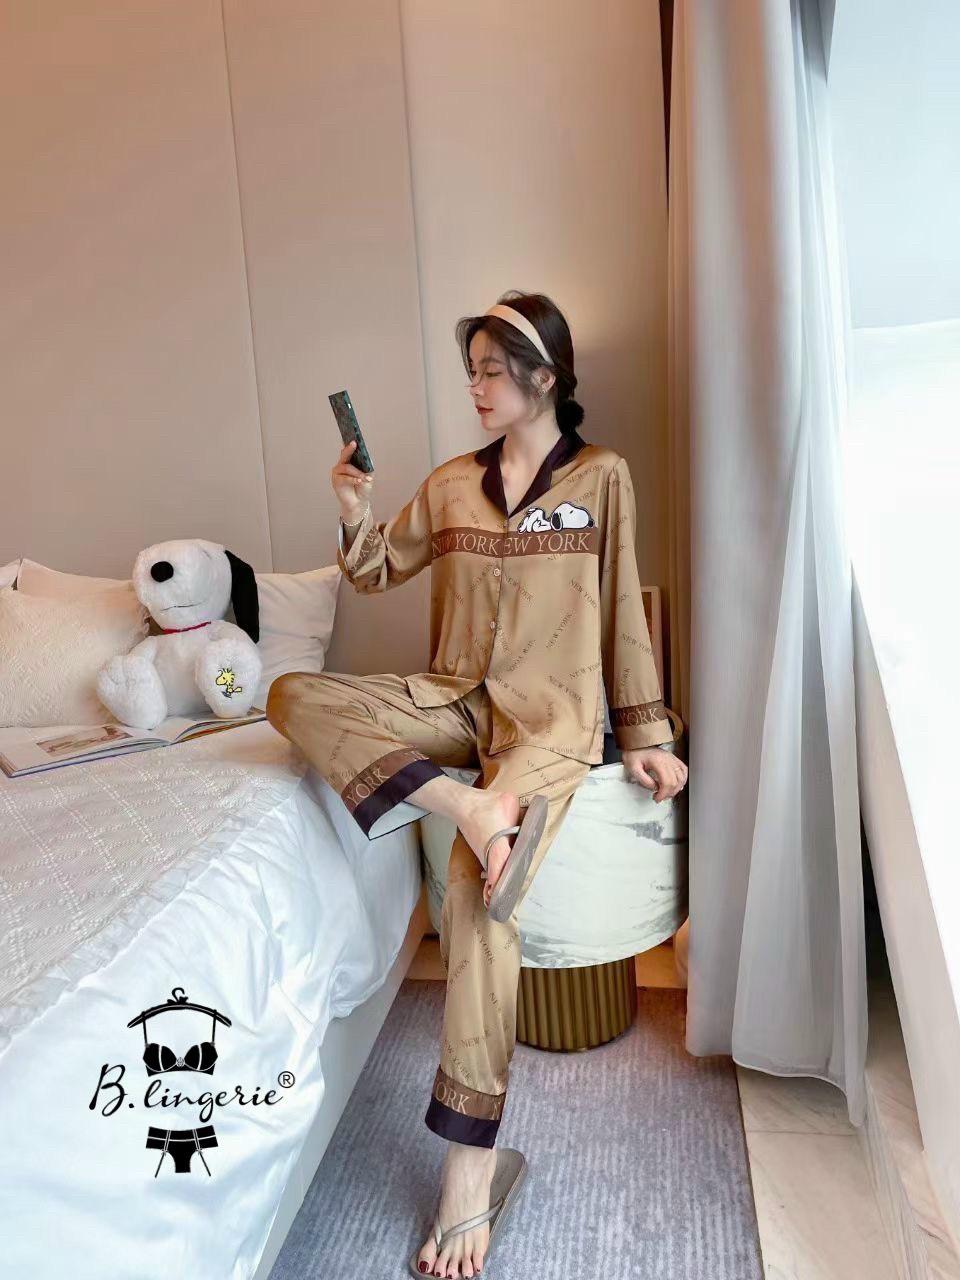 Đồ Bộ Ngủ Pyjama Nữ BLingerie